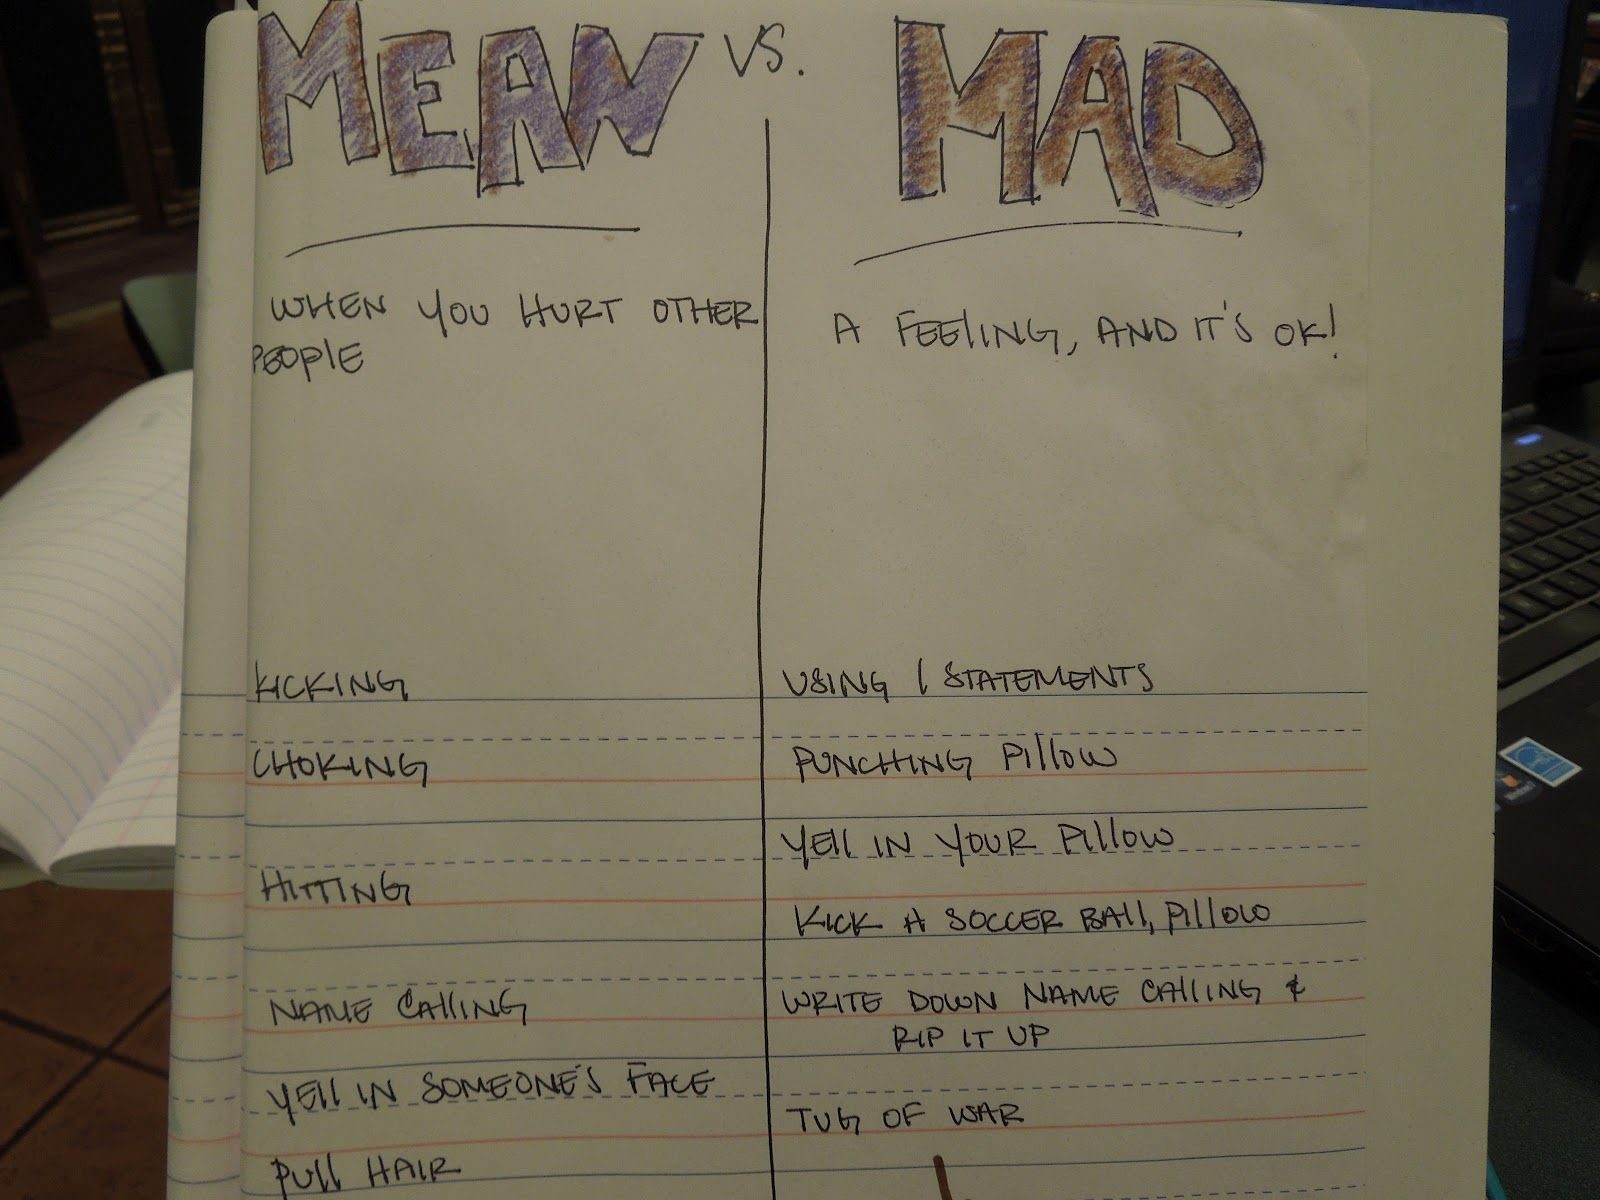 Behavioral Interventions For Kids Mad Vs Mean